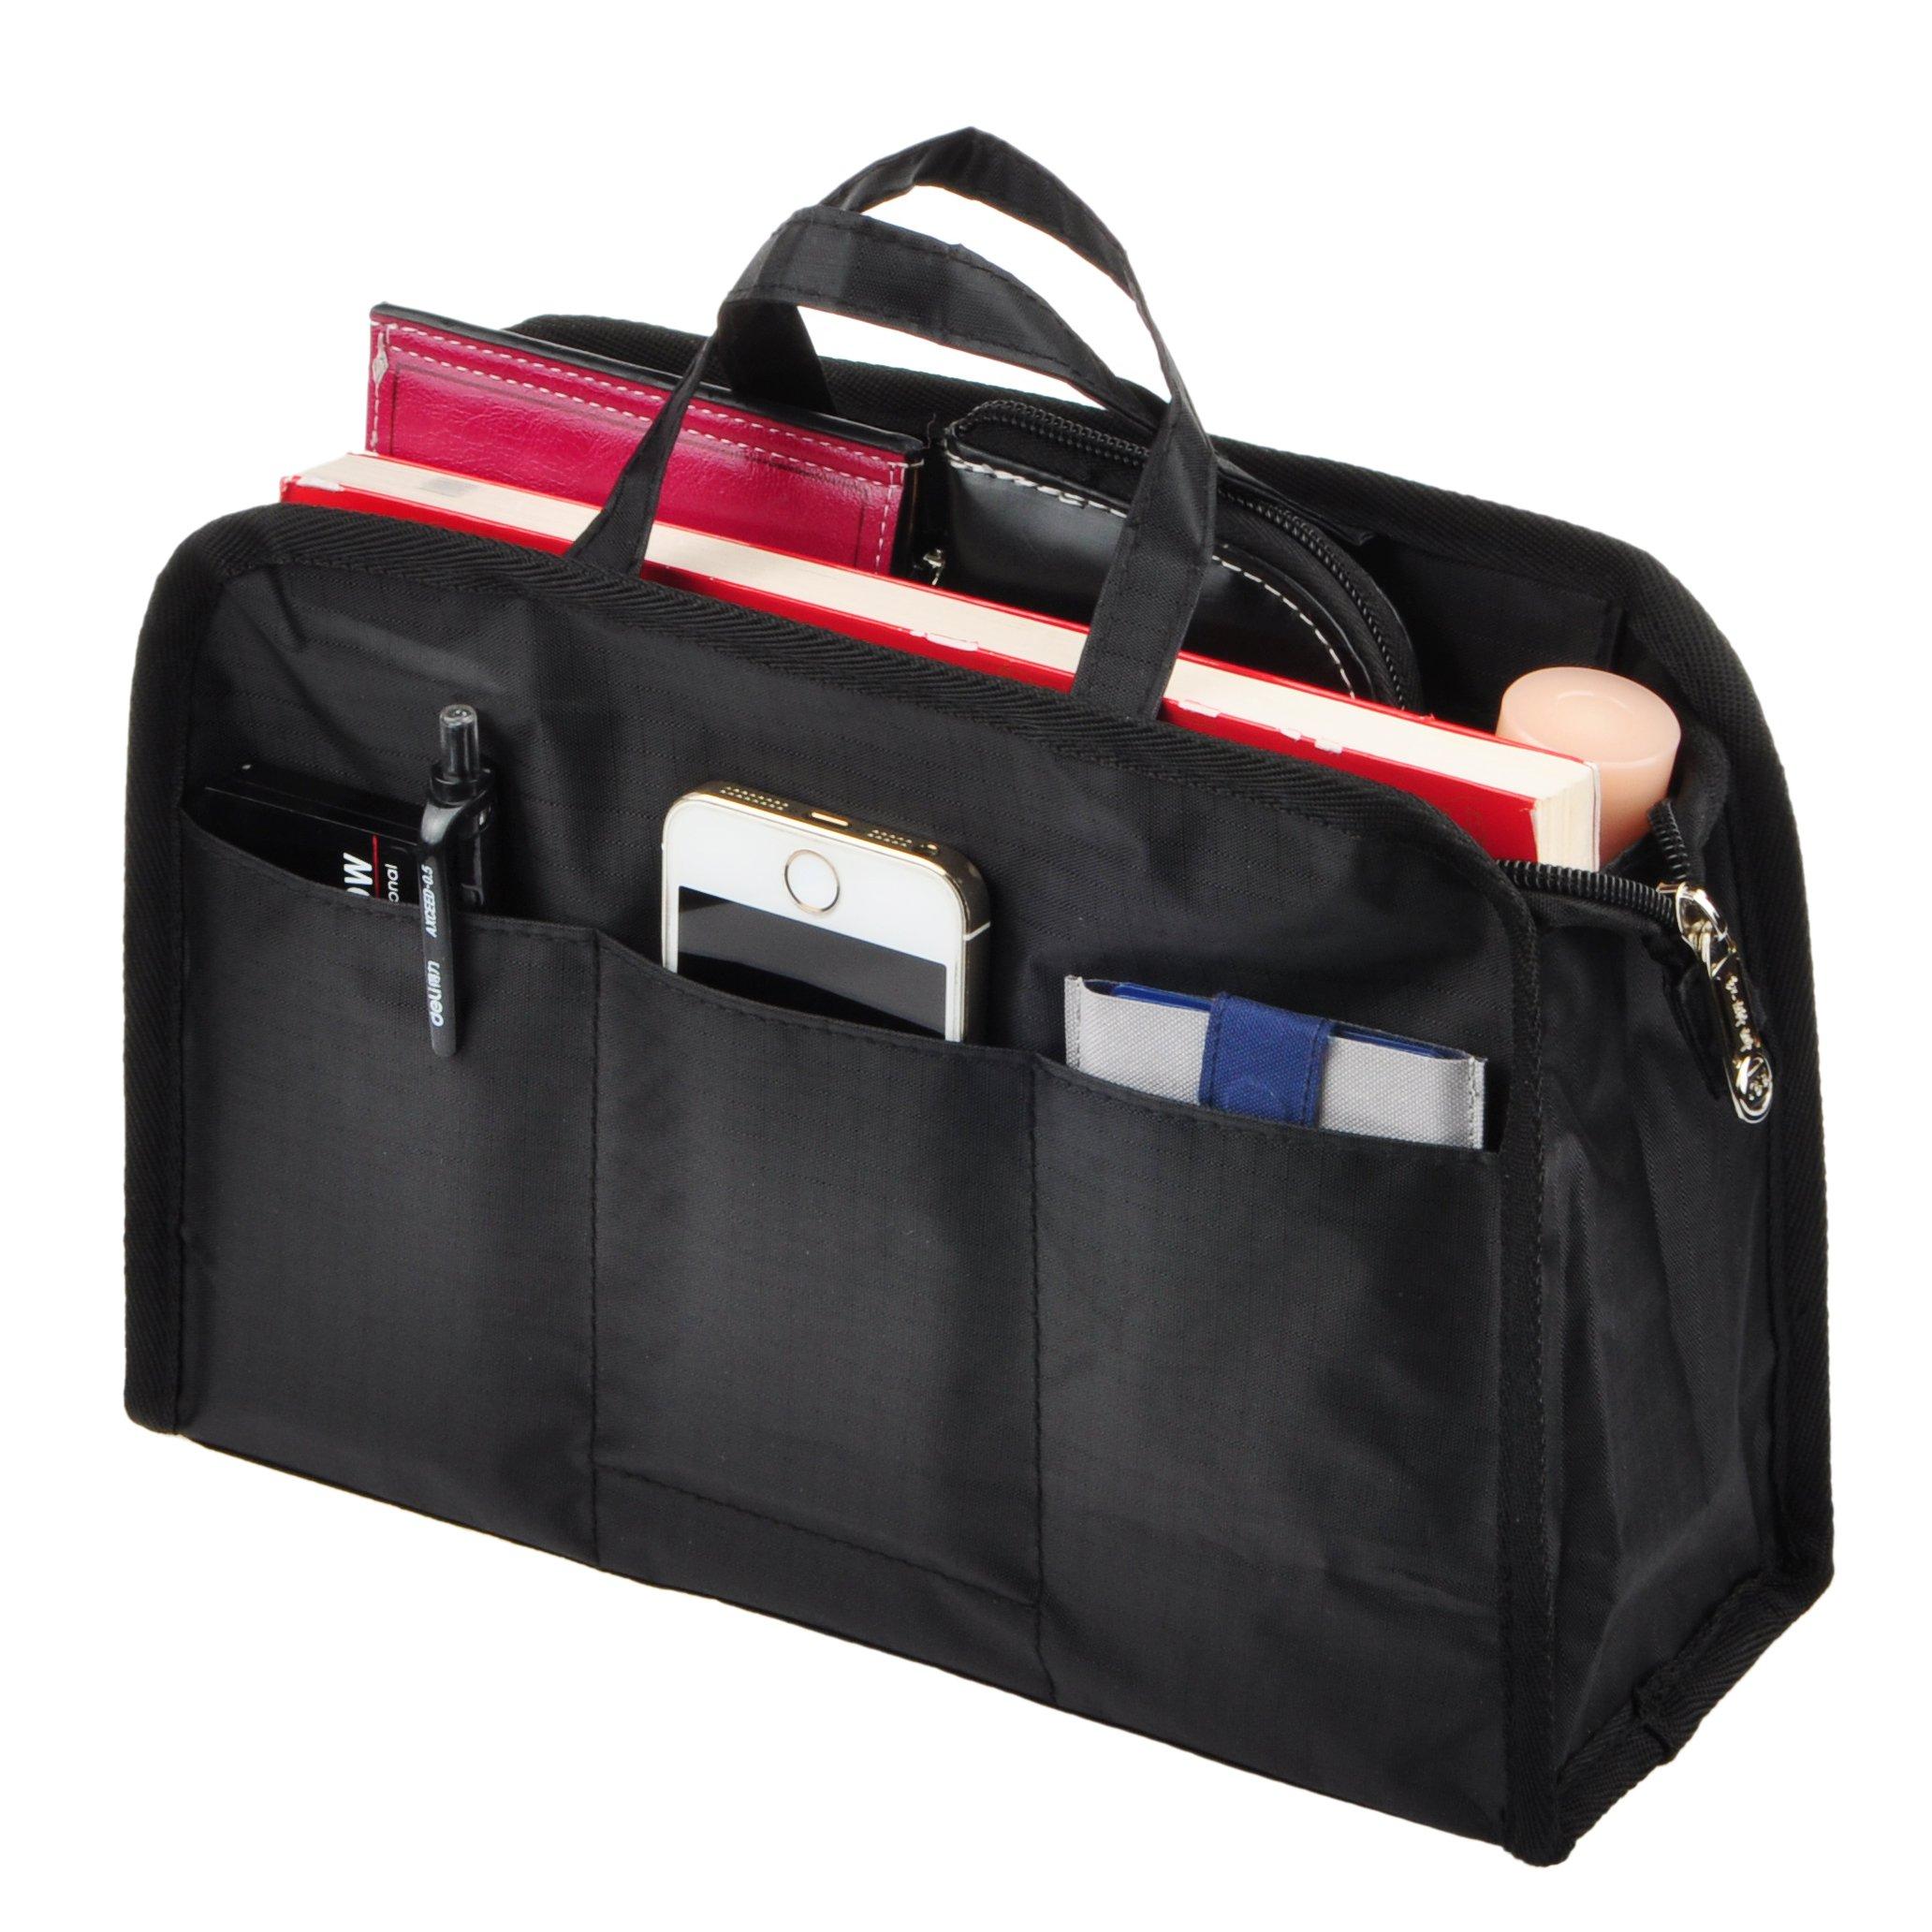 Vercord Sturdy Multi-Pocket Insert Handbag Bag Organizer Water-resistant Large Zipper Bag In Bag, Black Handles